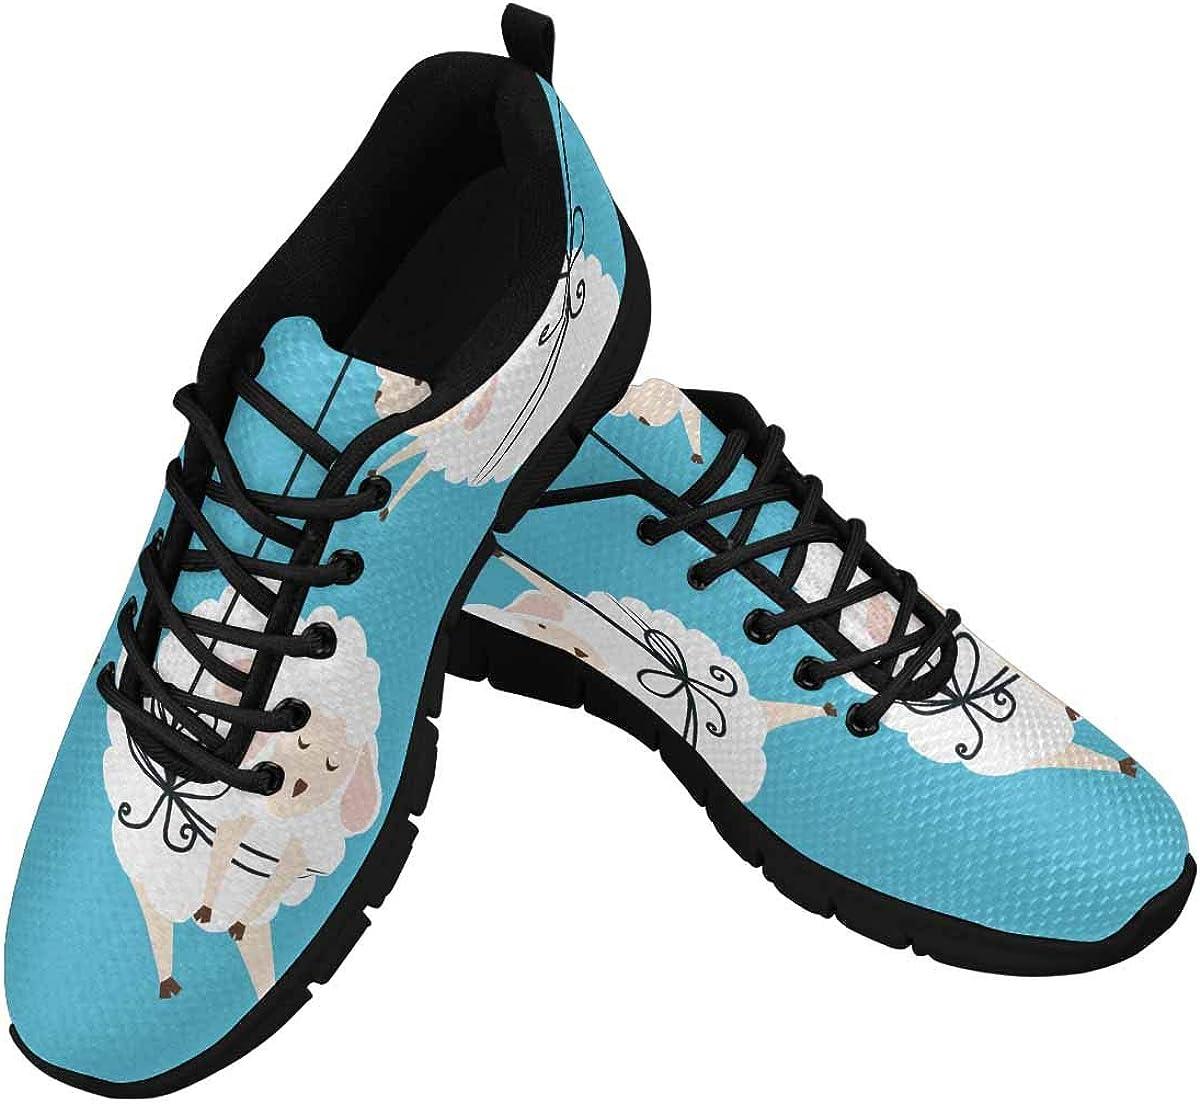 INTERESTPRINT Bundled Three Sheep Women's Sneaker Lace Up Running Comfort Sports Shoes